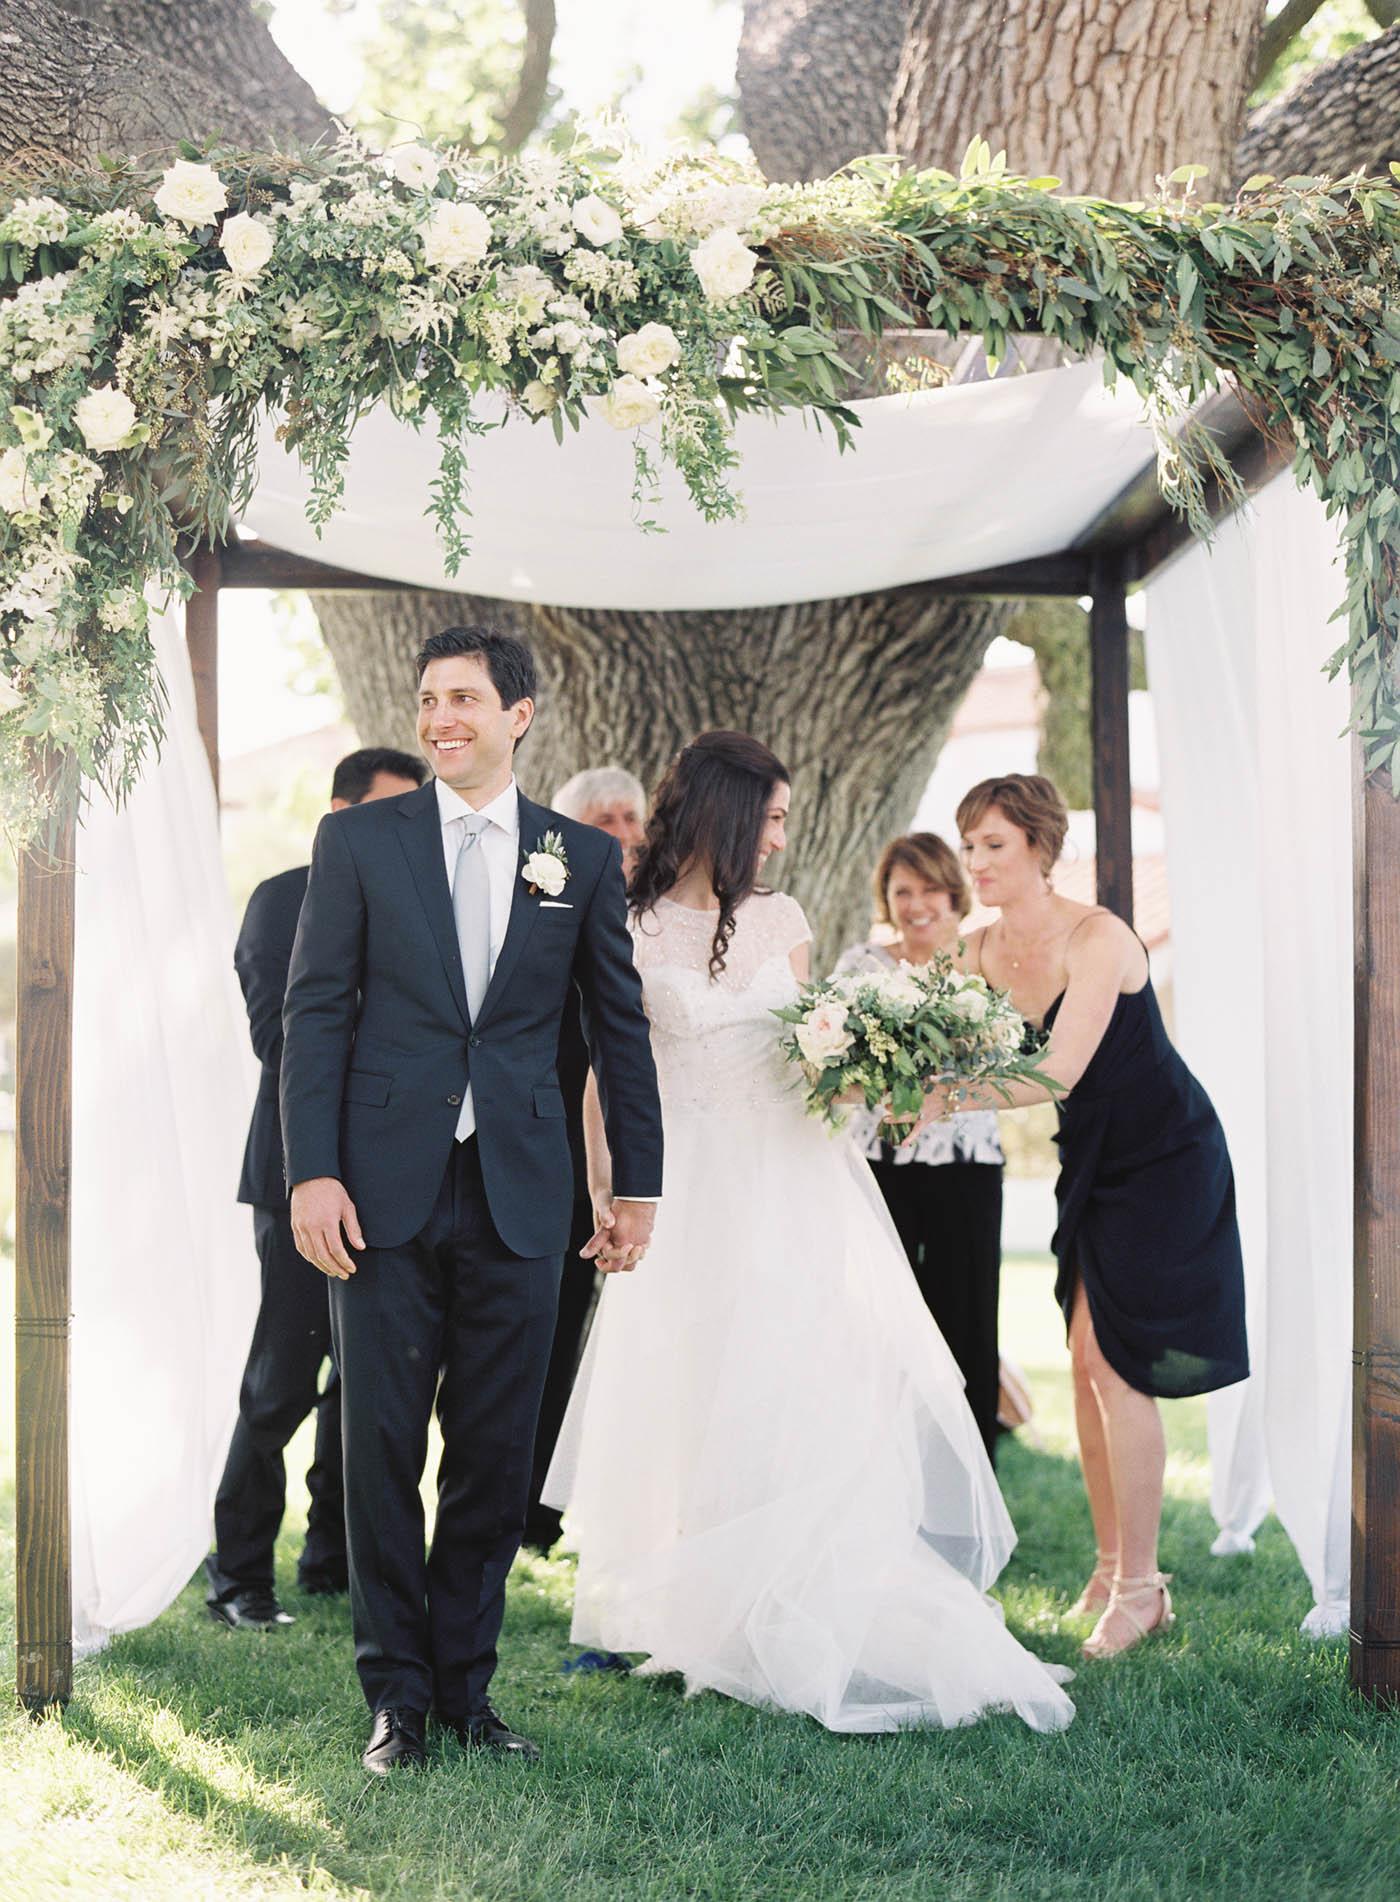 ojai-valley-inn-summer-wedding-jen-huang-16.jpg